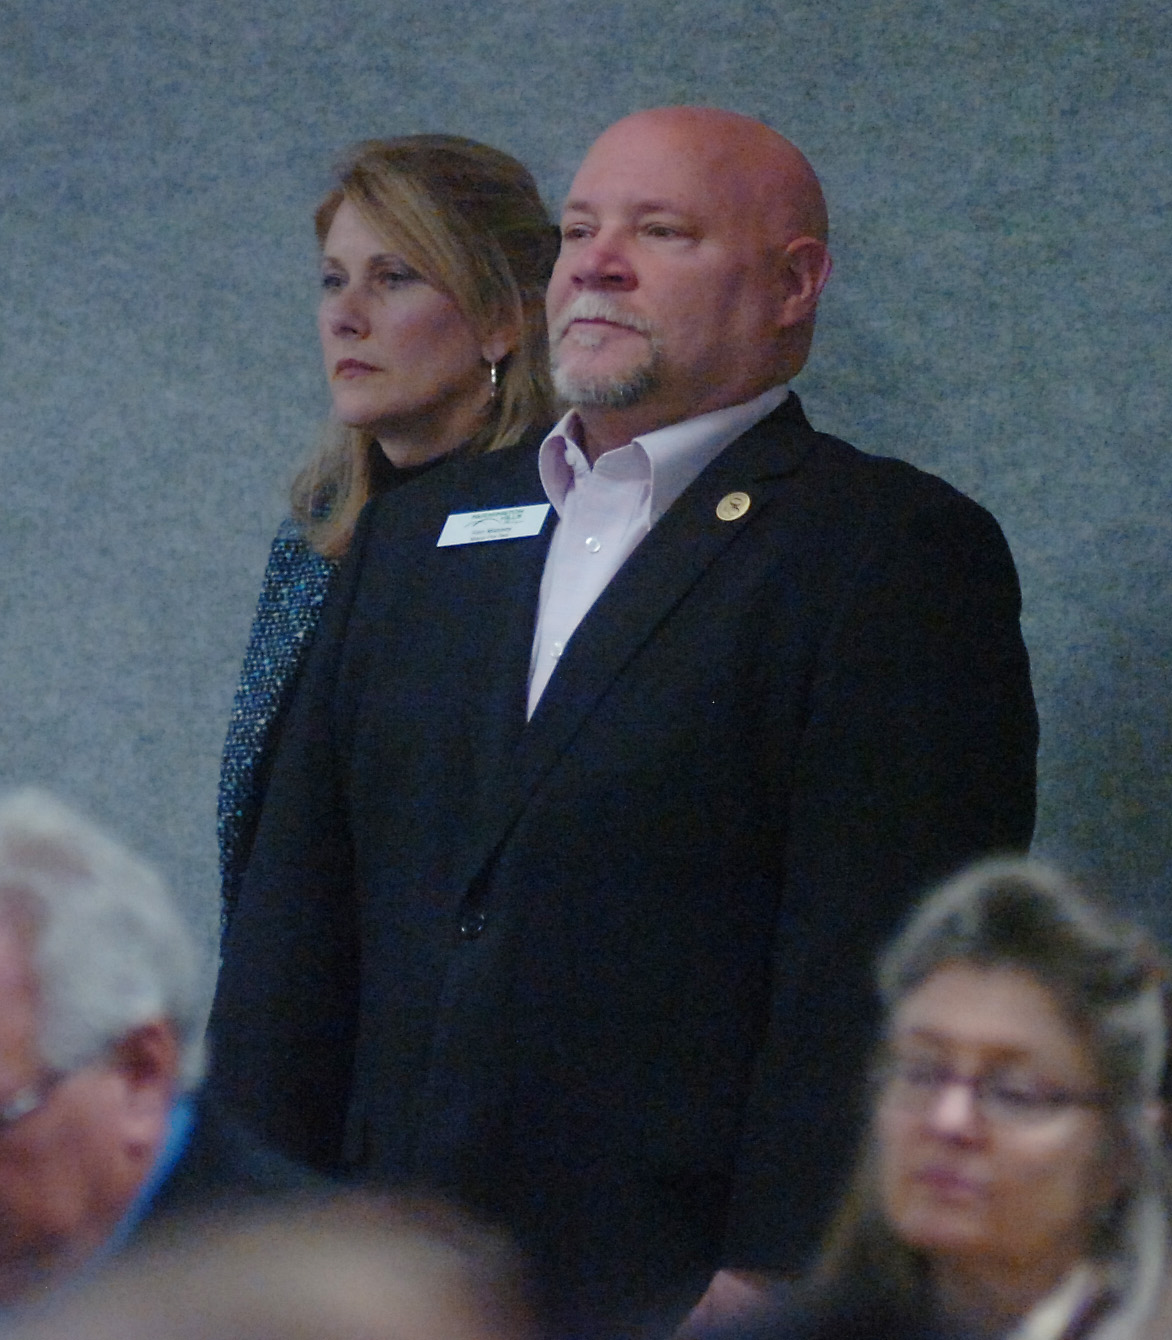 Ken Massey listens to Suecide prevention speaker Jordan Burnham.He was responcible for Burnham being at the Costick  Center.